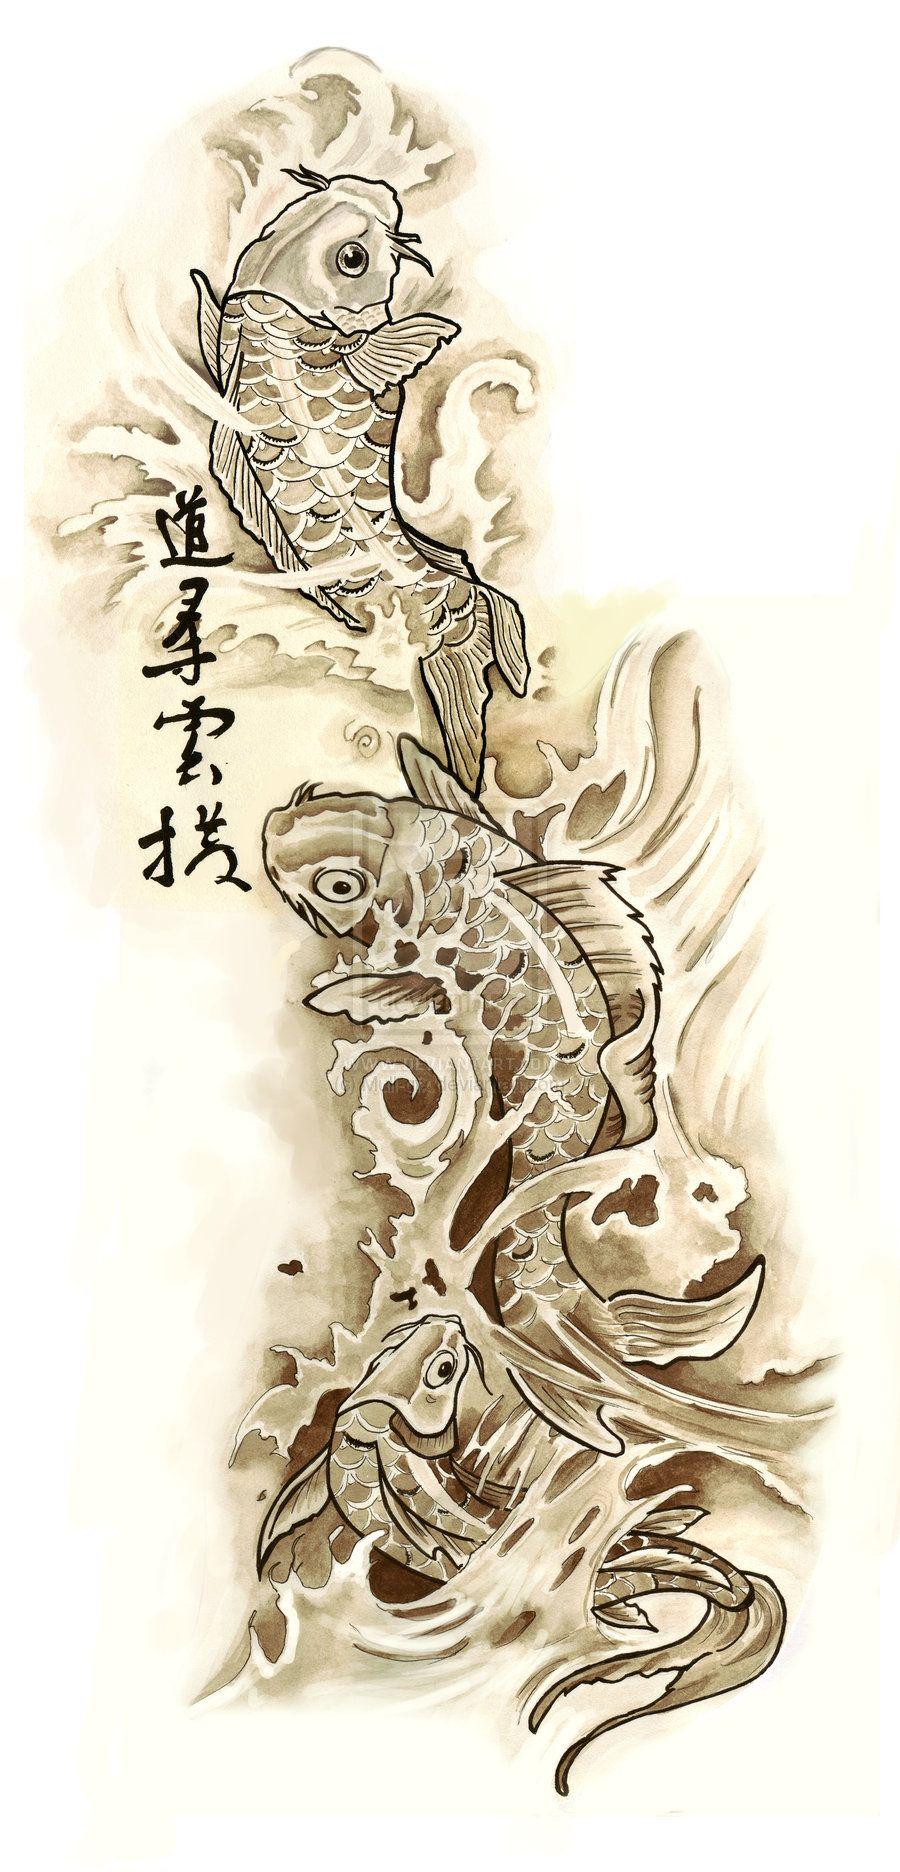 Koi tattoo google zoeken tattoos pinterest koi tattoo design koi tattoo design by mull art on deviantart this could be sooo colorful izmirmasajfo Images